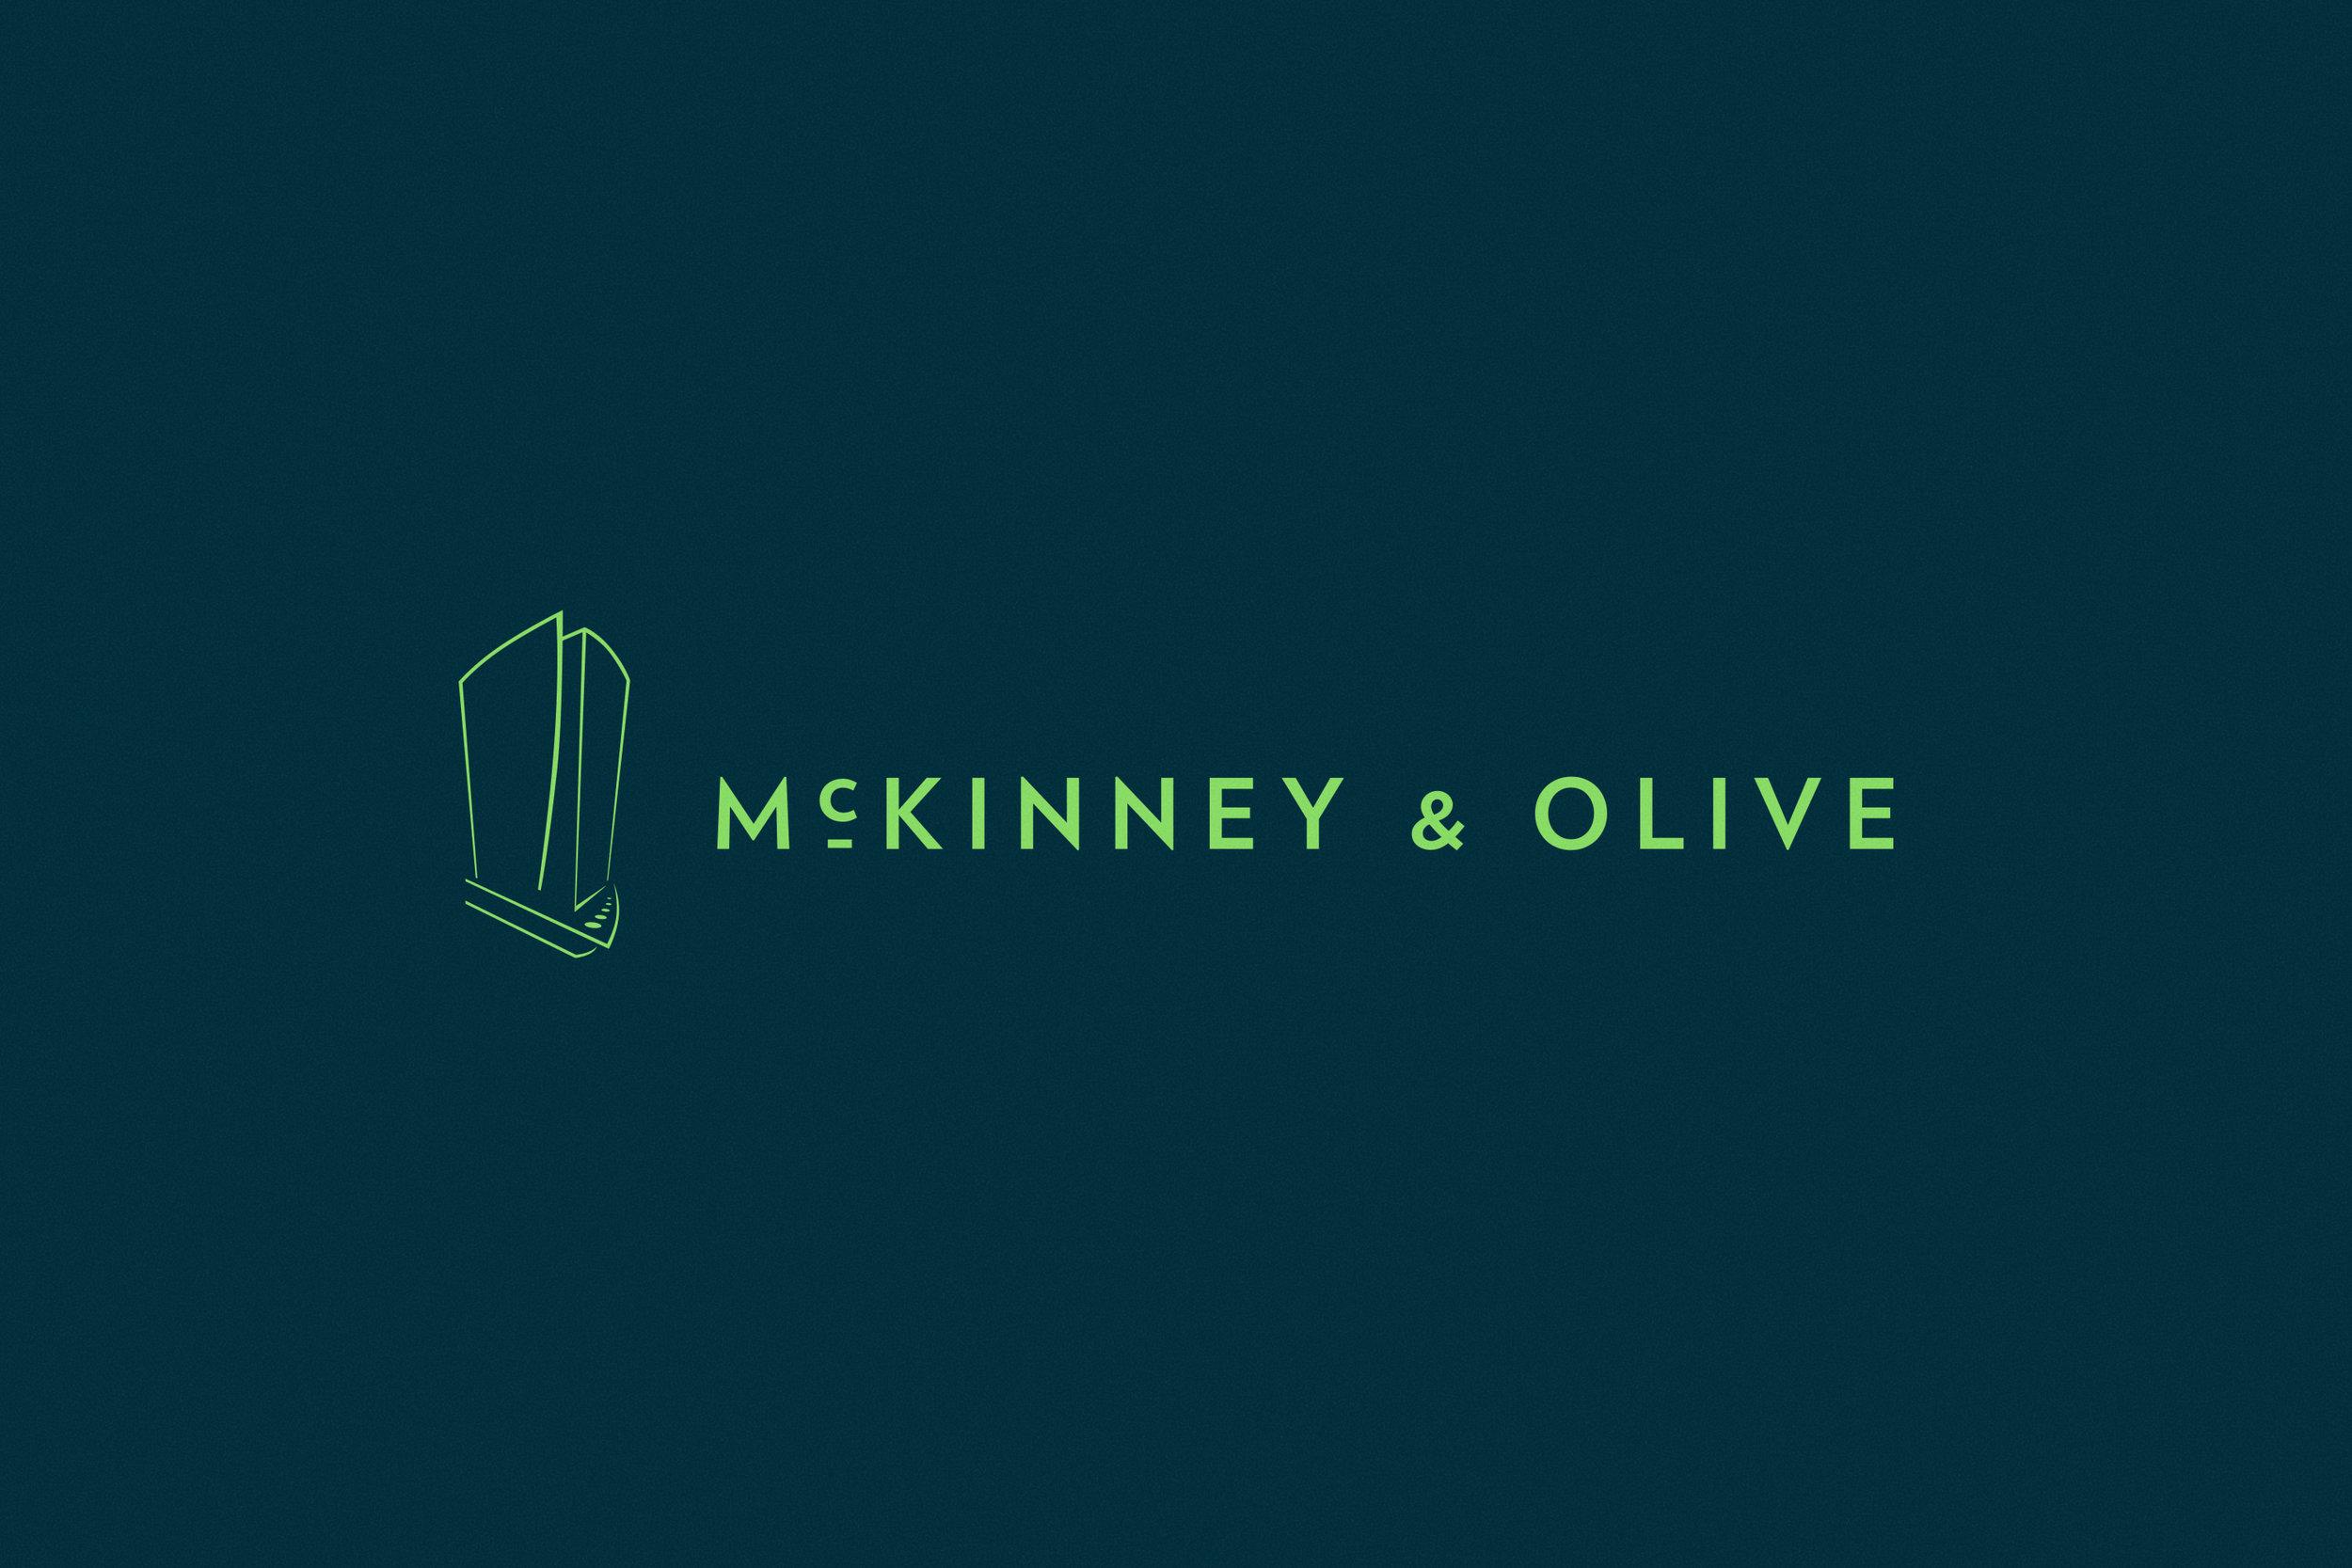 ronaldvillegas-mckinney-and-olive-logo-horizontal.jpg